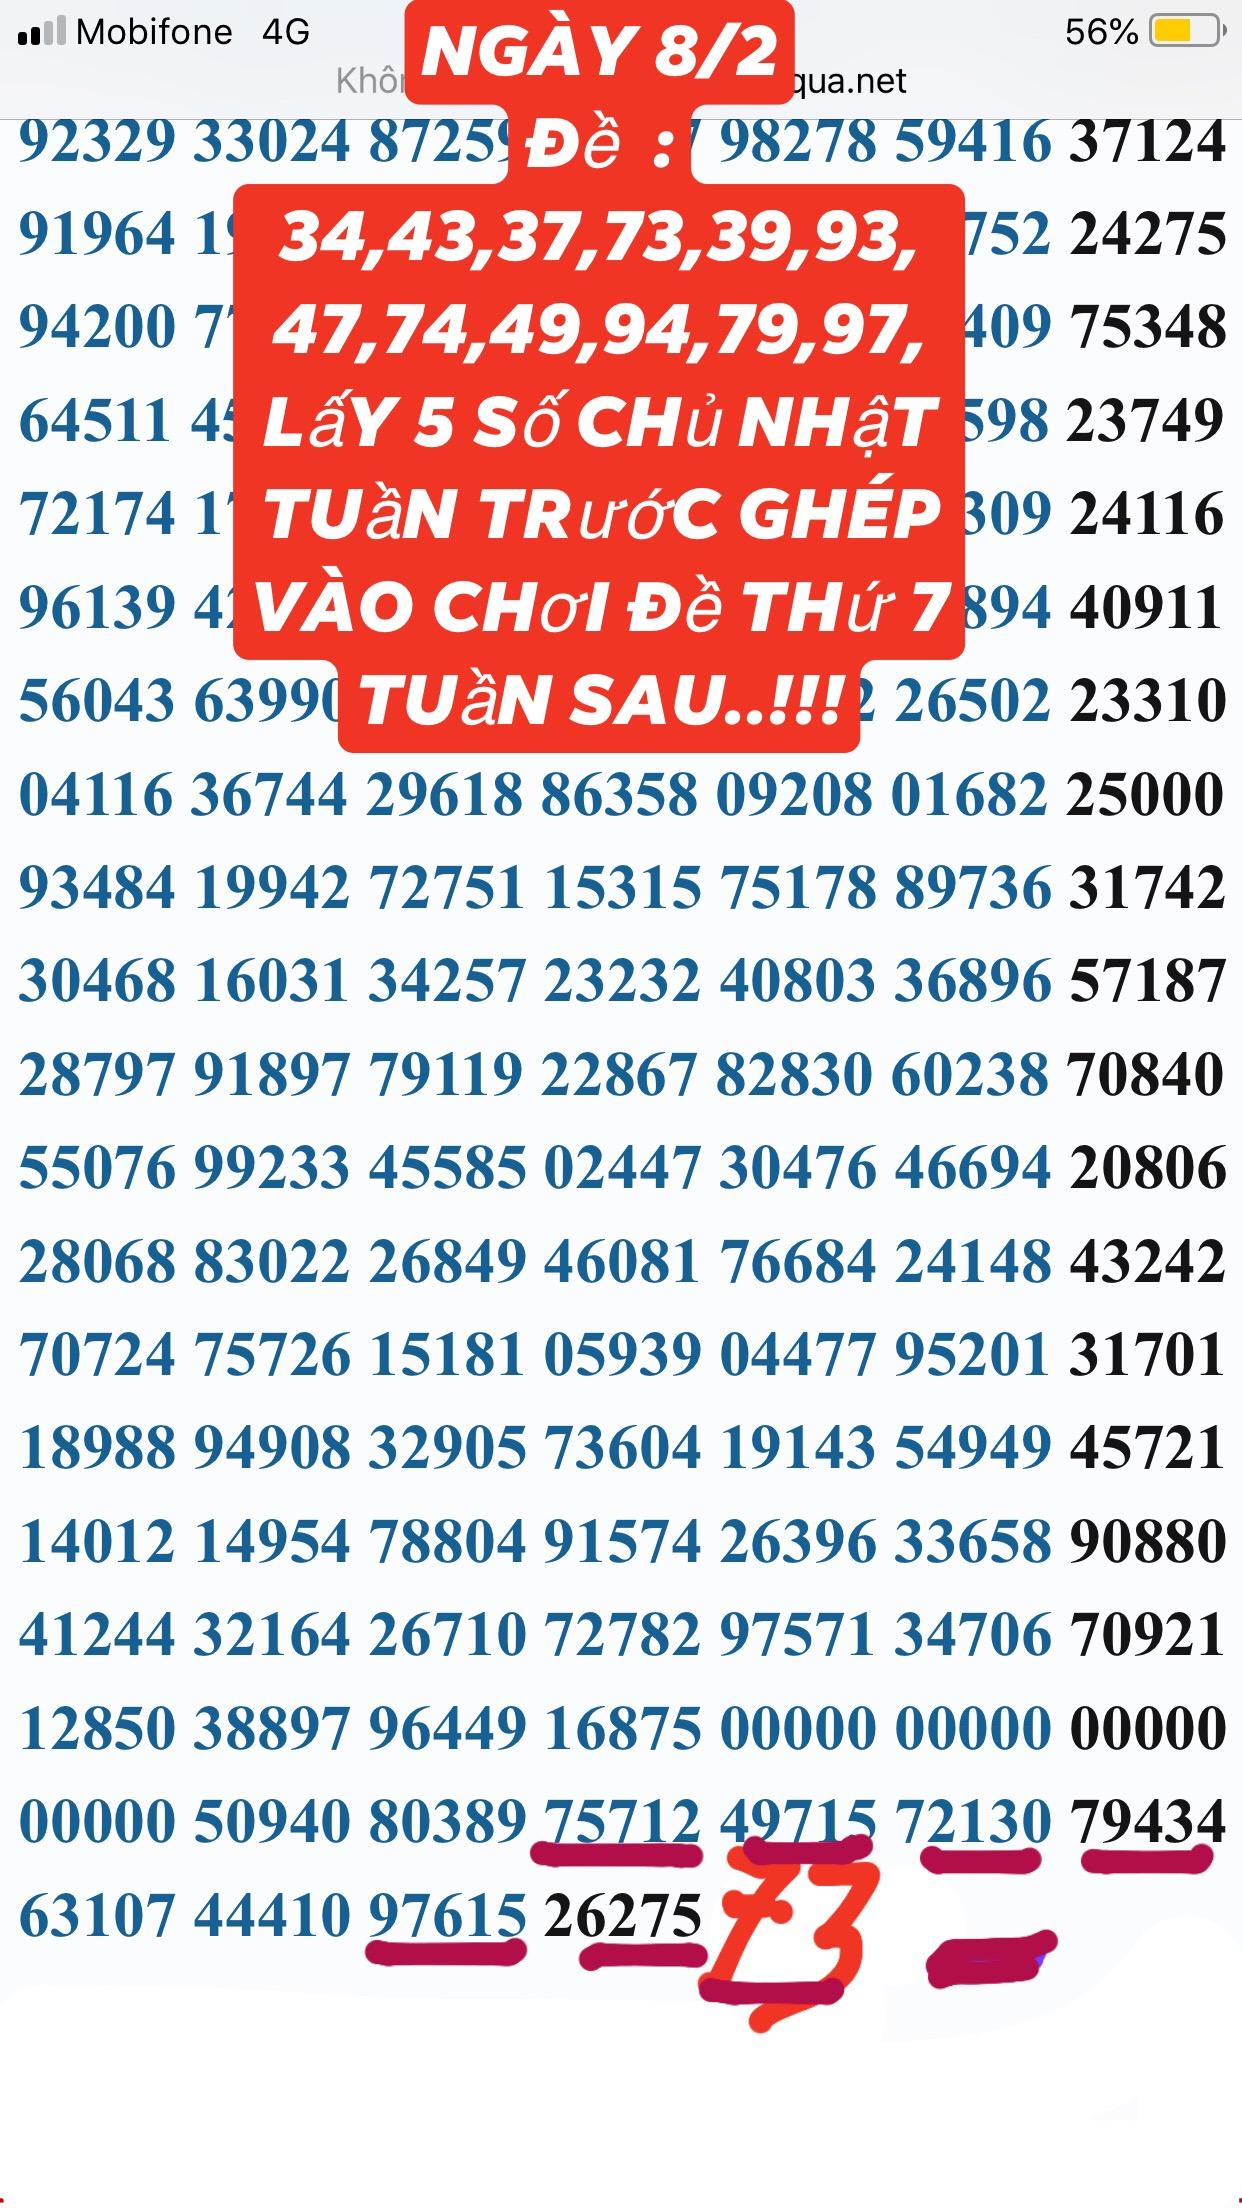 176CC726-BAE9-4150-9A1C-27566422B4E7.jpeg